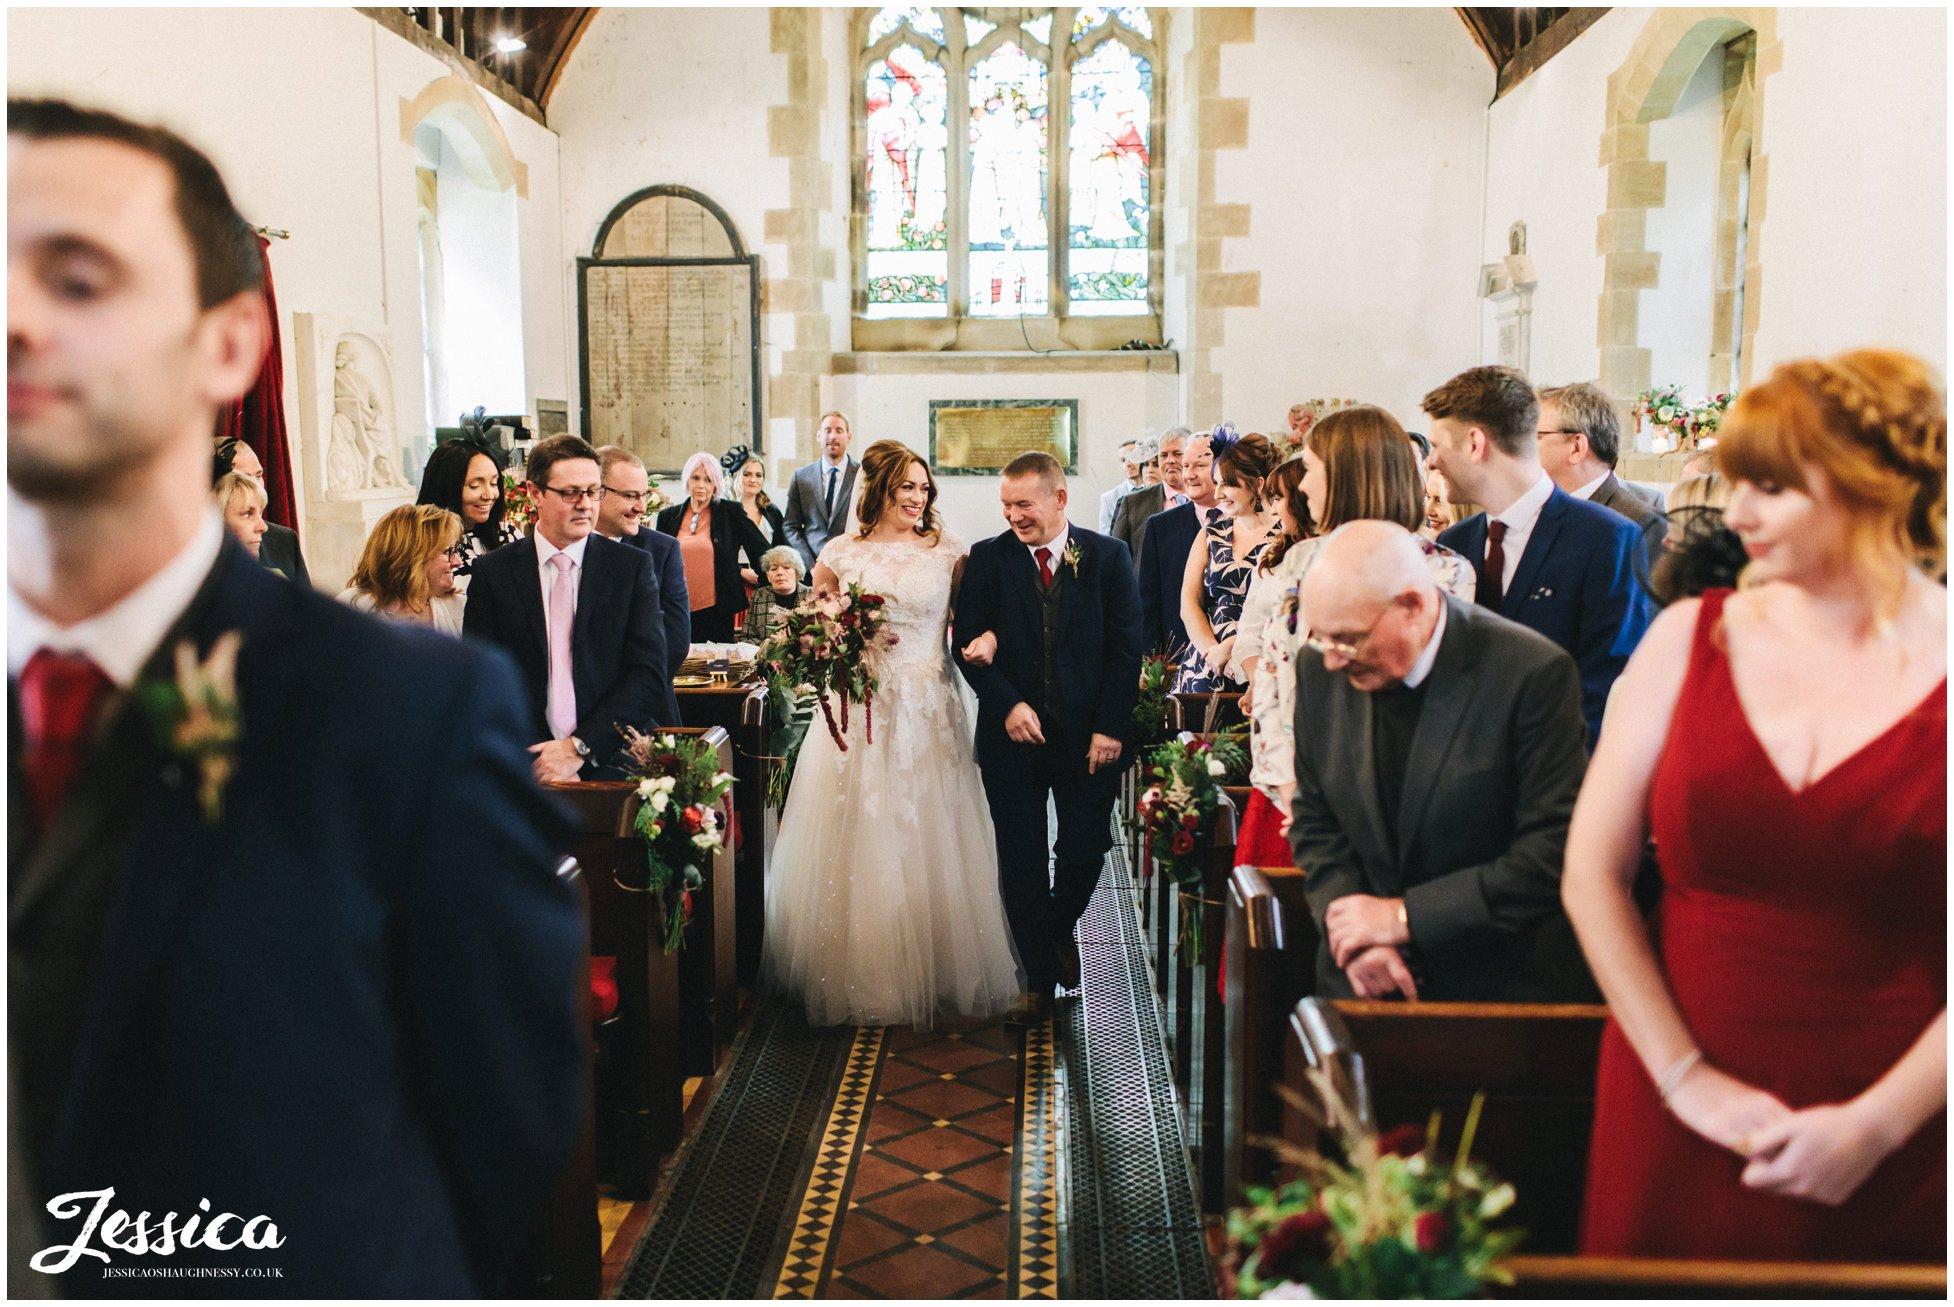 the bride walks down Llantysilio church aisle with her father